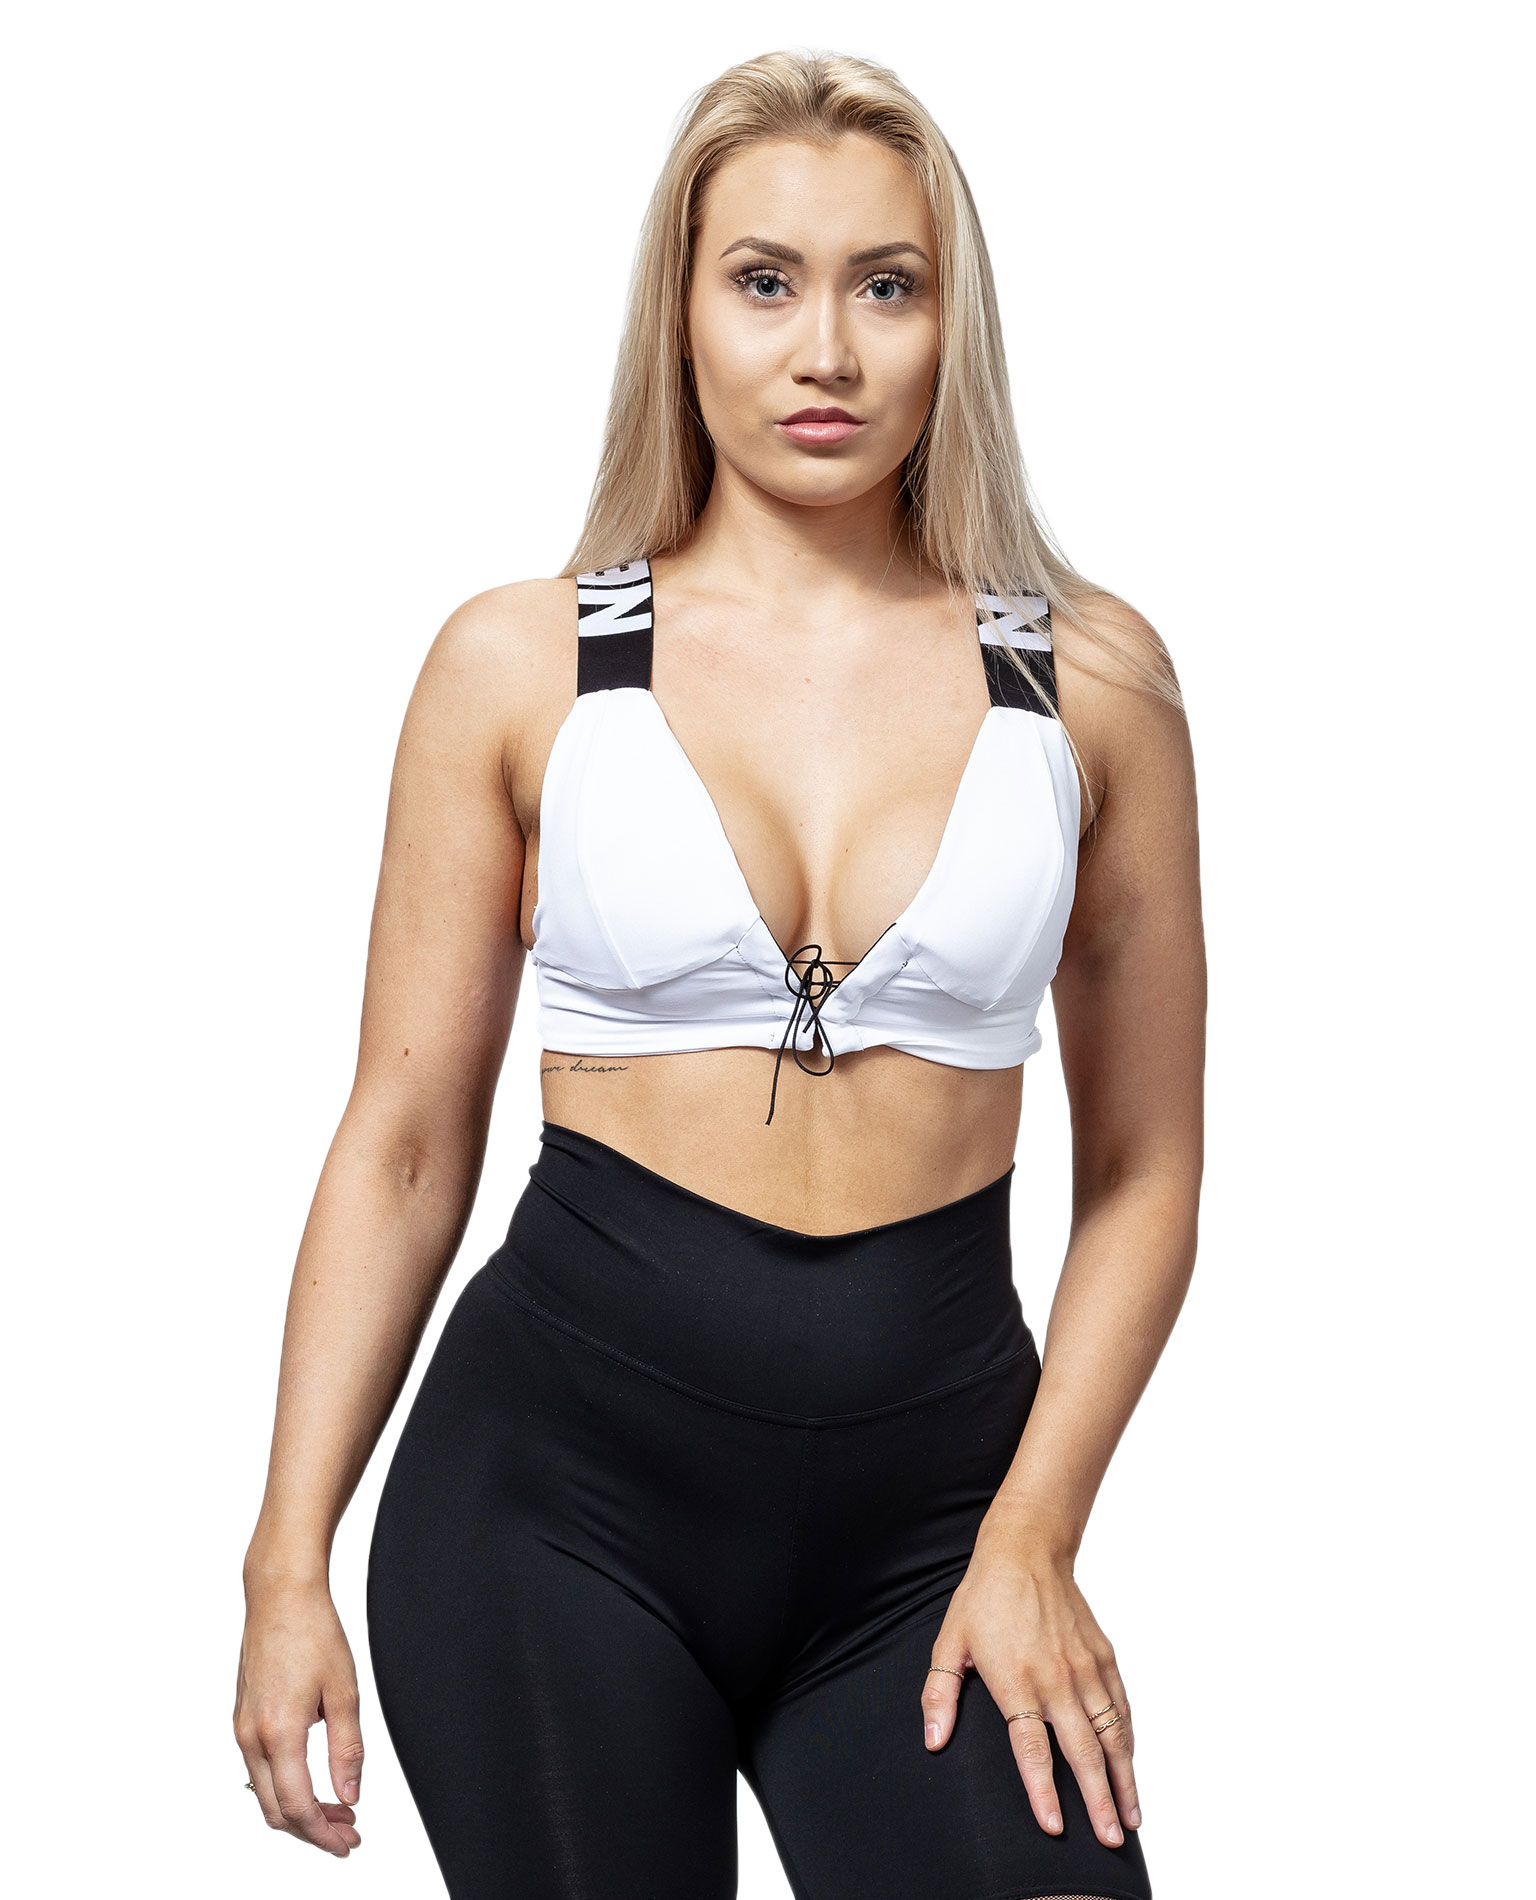 Nebbia Lace Up Sports Bra 694 Bourgogne Sport Soutien-gorge Mini Top Fitness Gym Wear